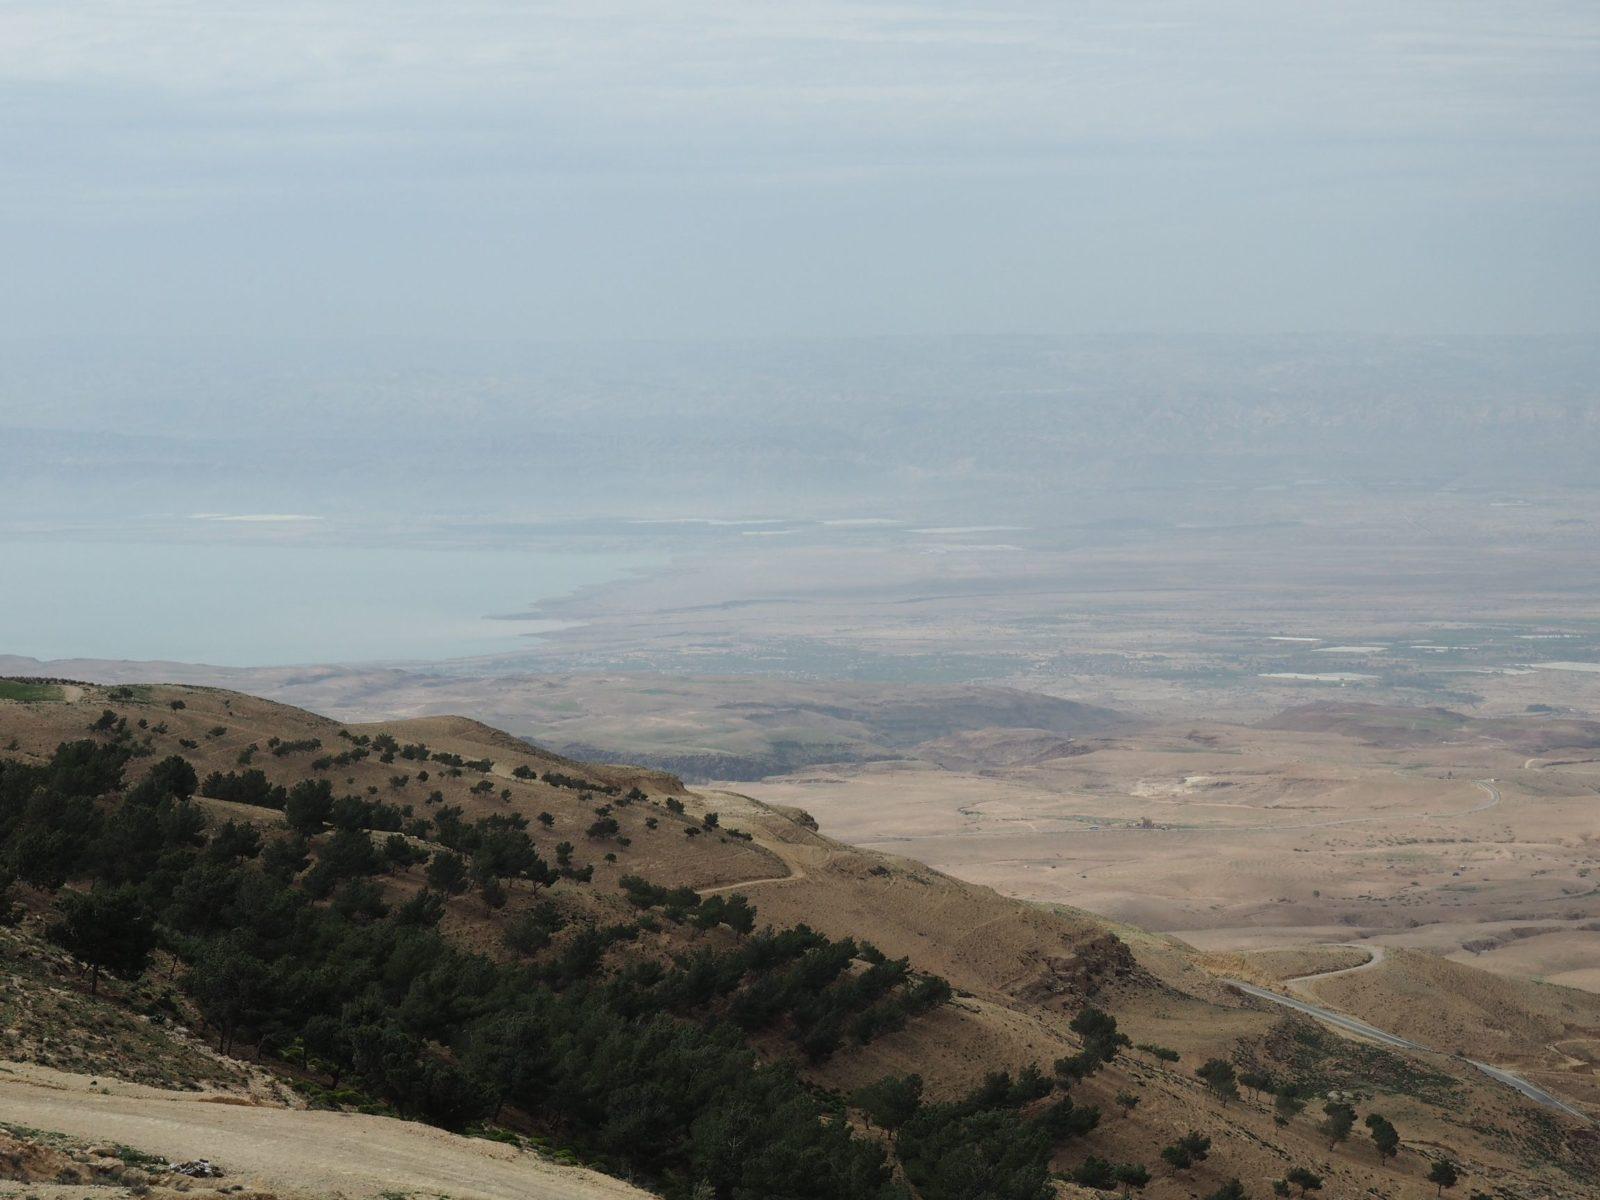 Blick vom Berg Nebo